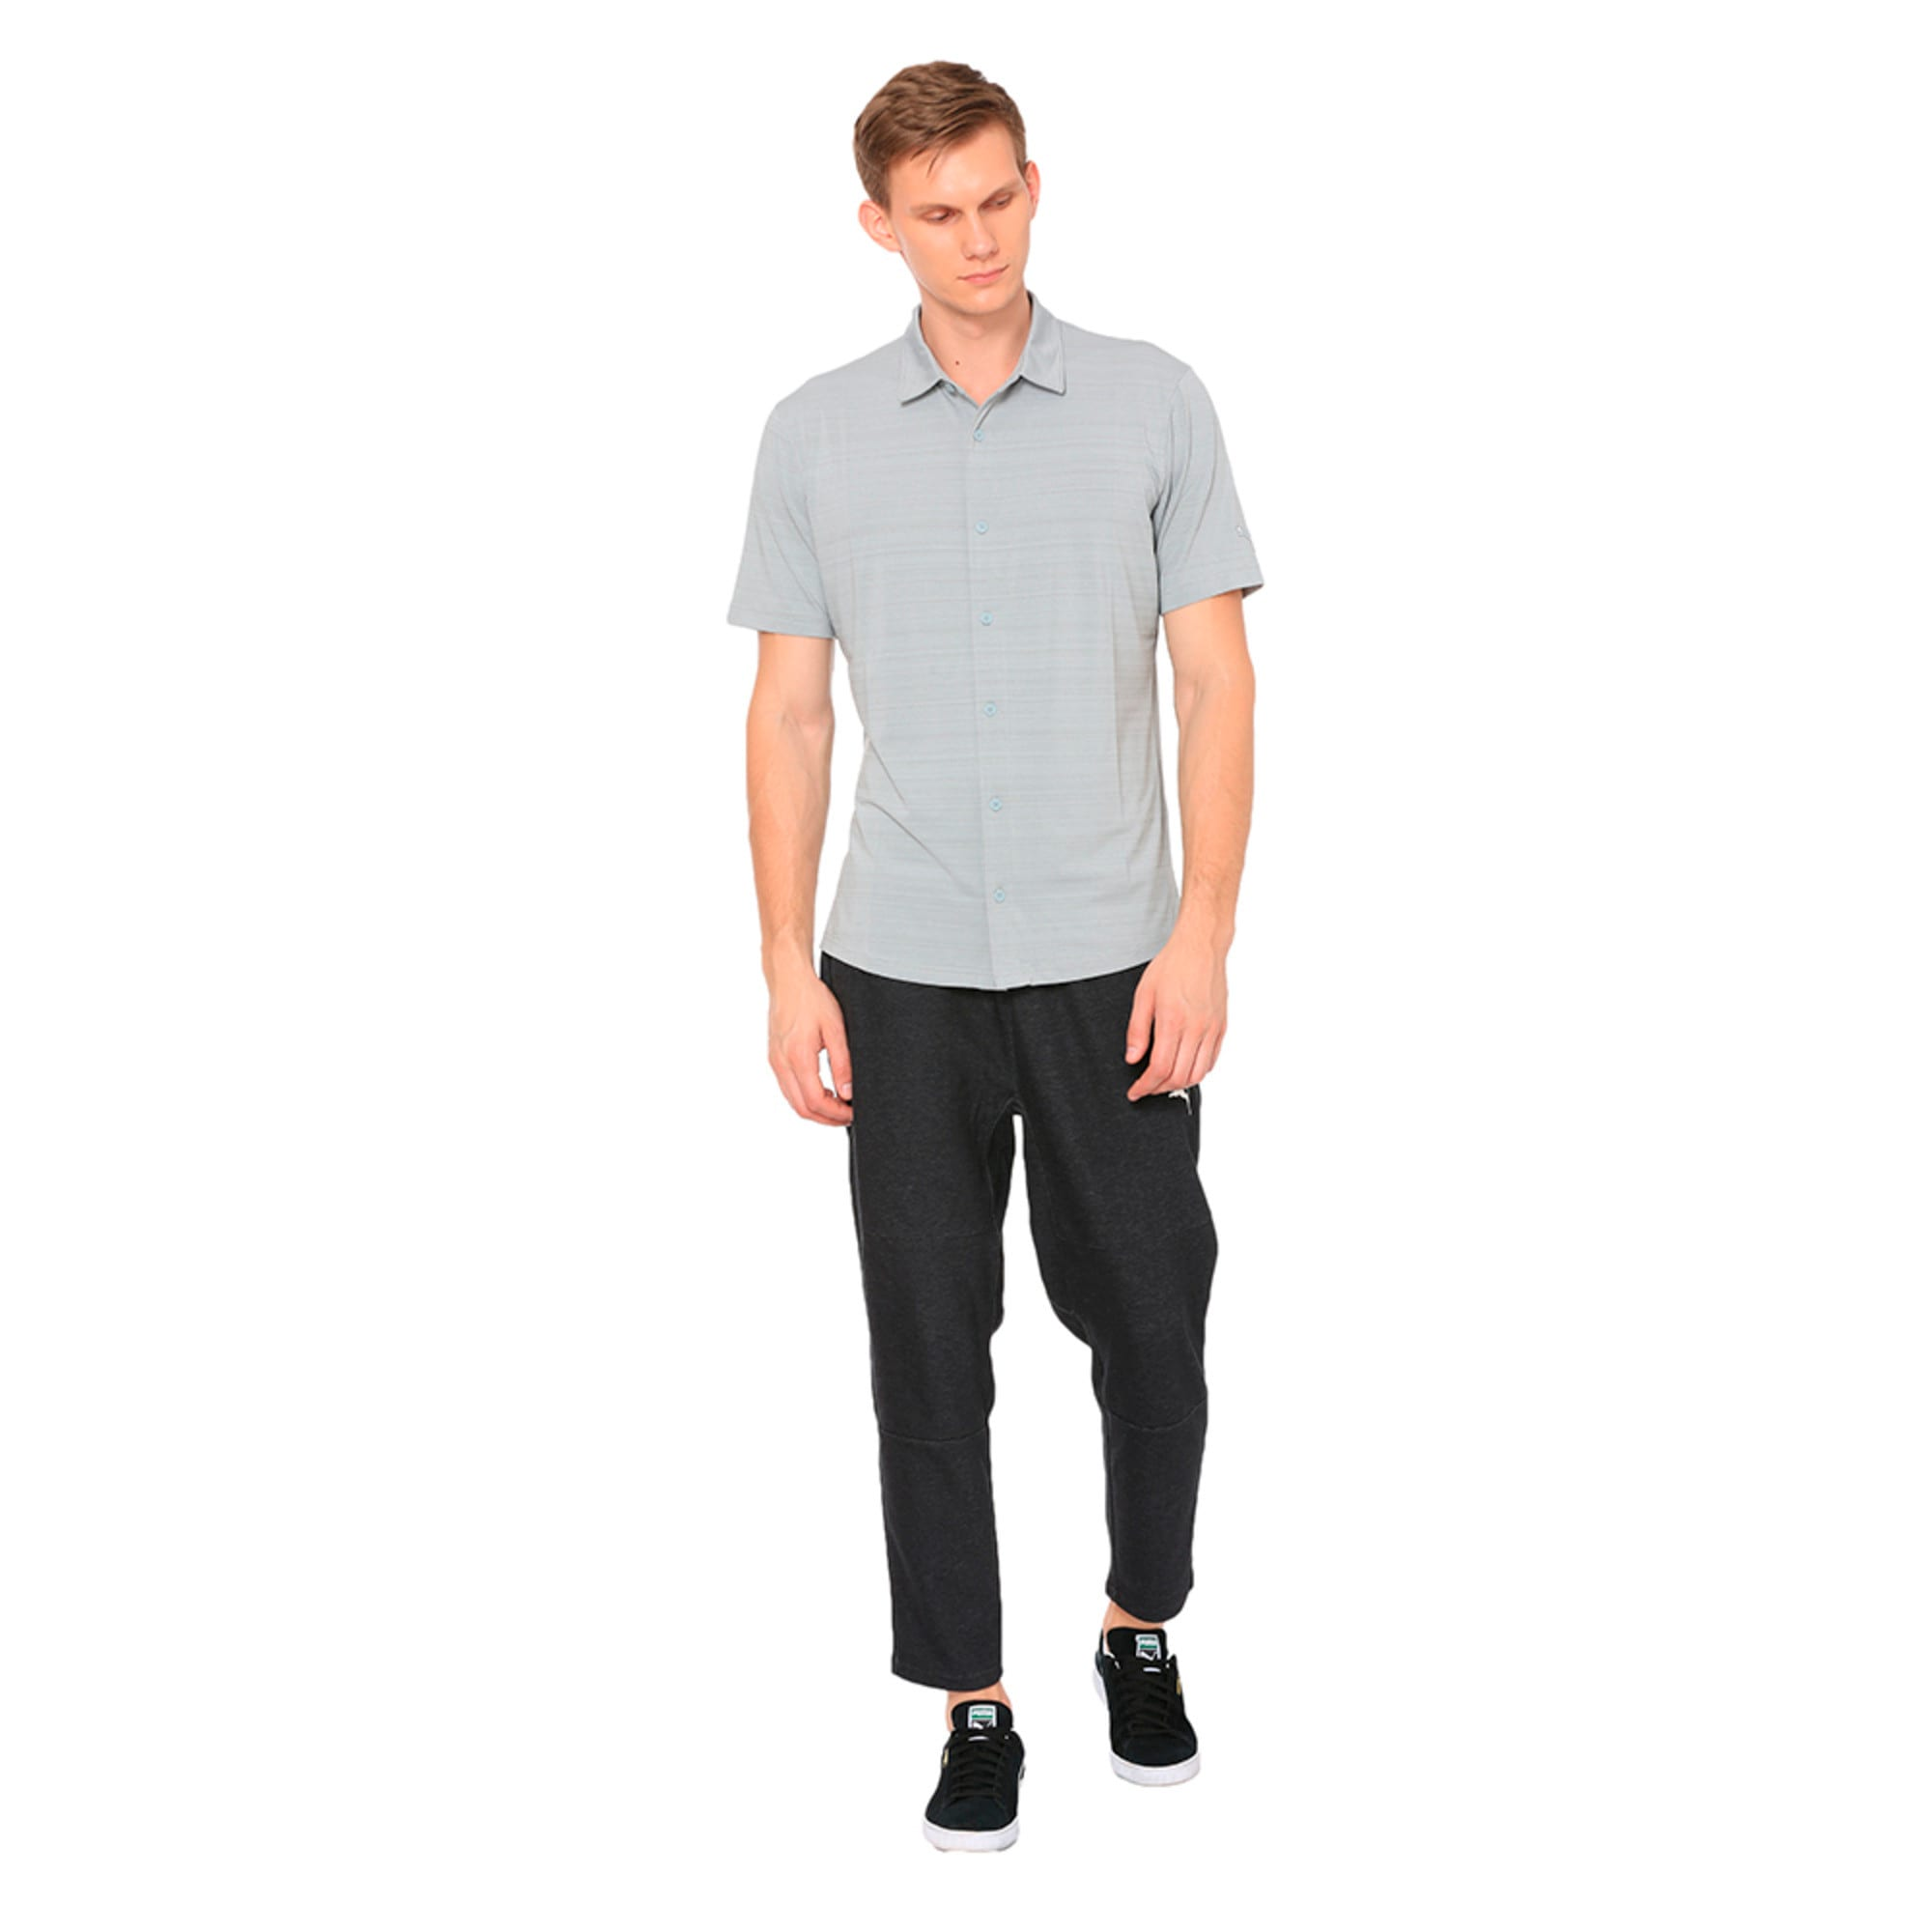 Thumbnail 3 of Breezer Short Sleeve Men's Golf Shirt, Quarry, medium-IND